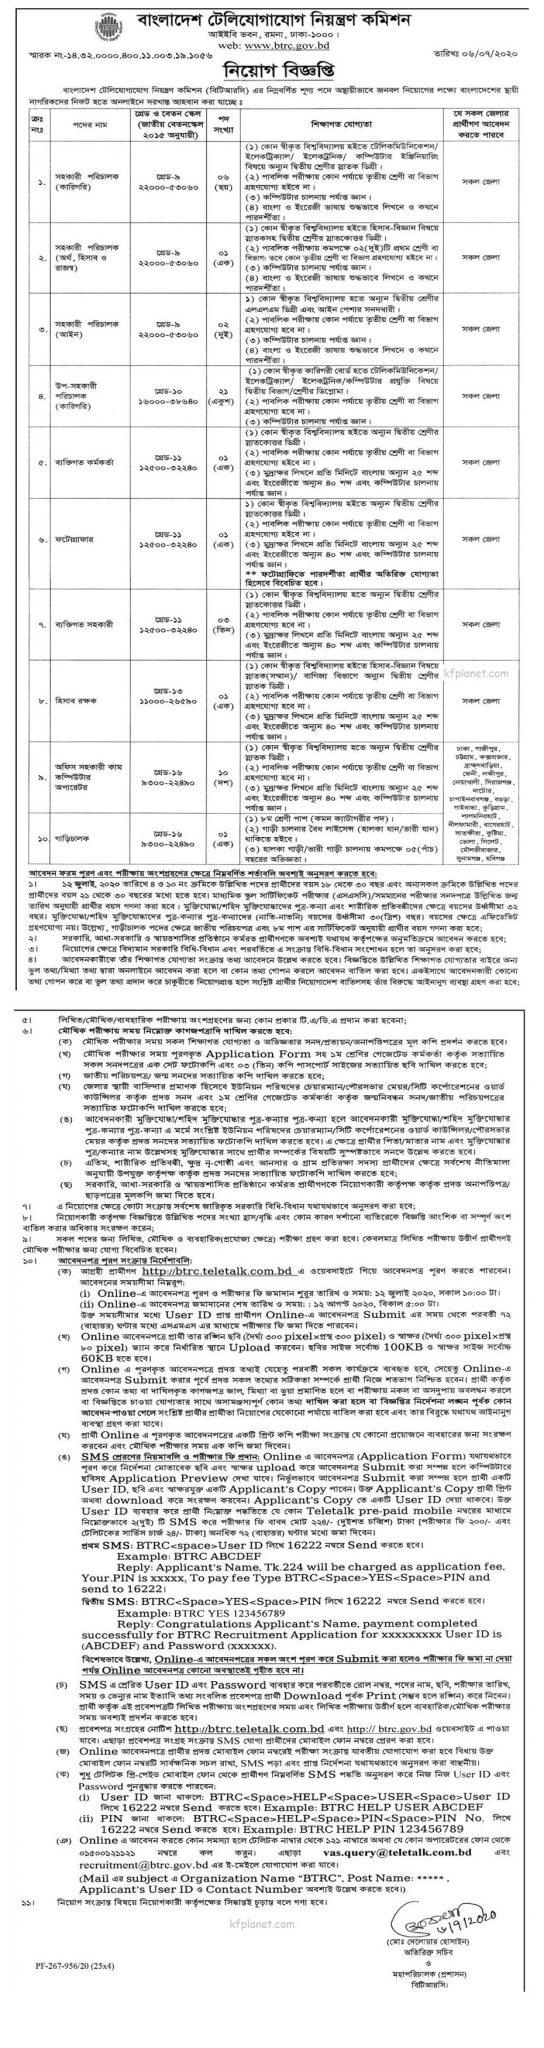 Bangladesh Telecommunication Regulatory Commission (BTRC) Job Circular 2020